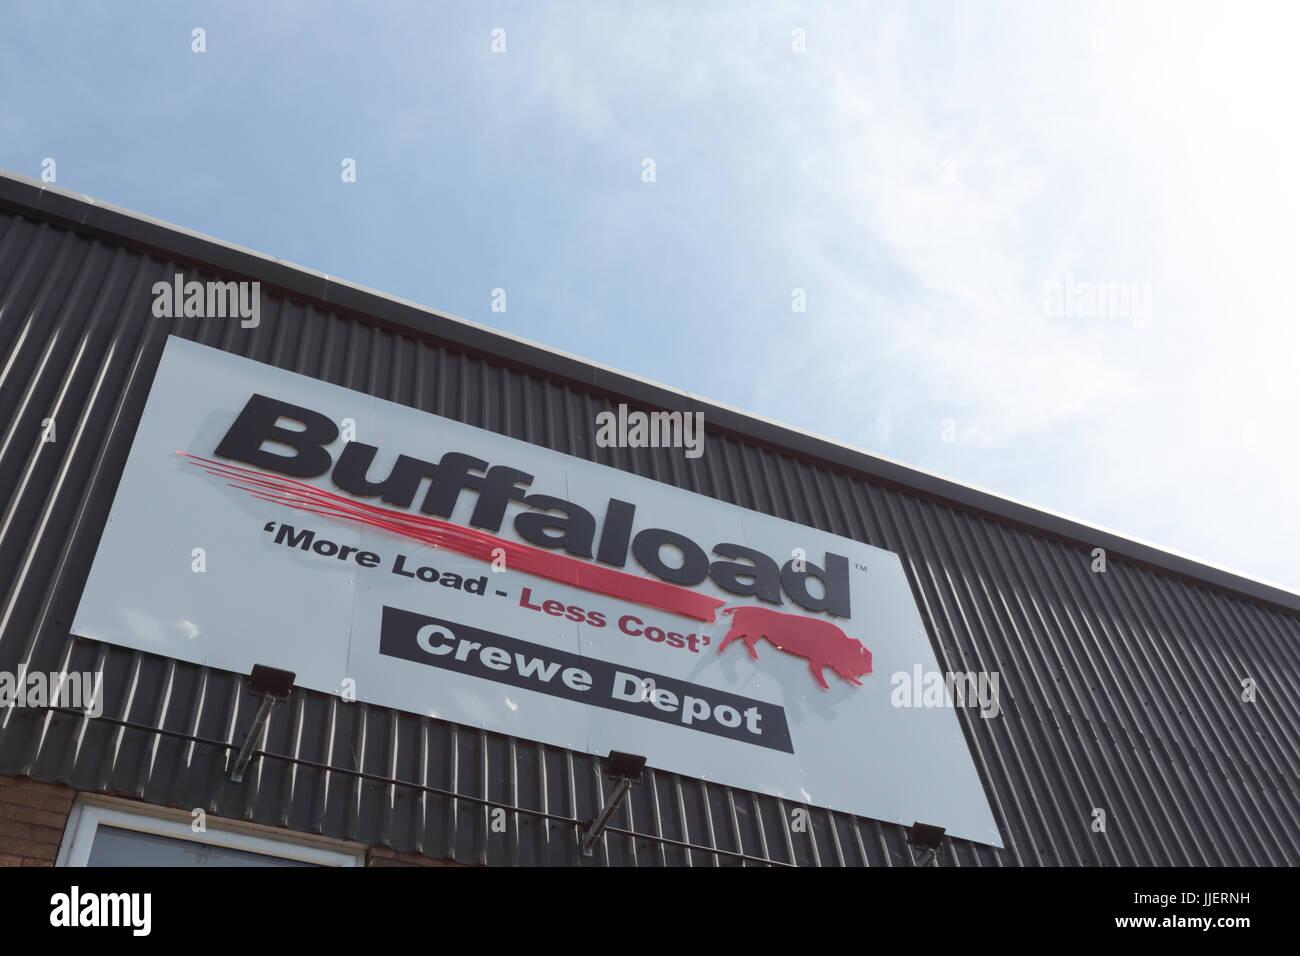 Buffaload, Crewe Depot - Stock Image